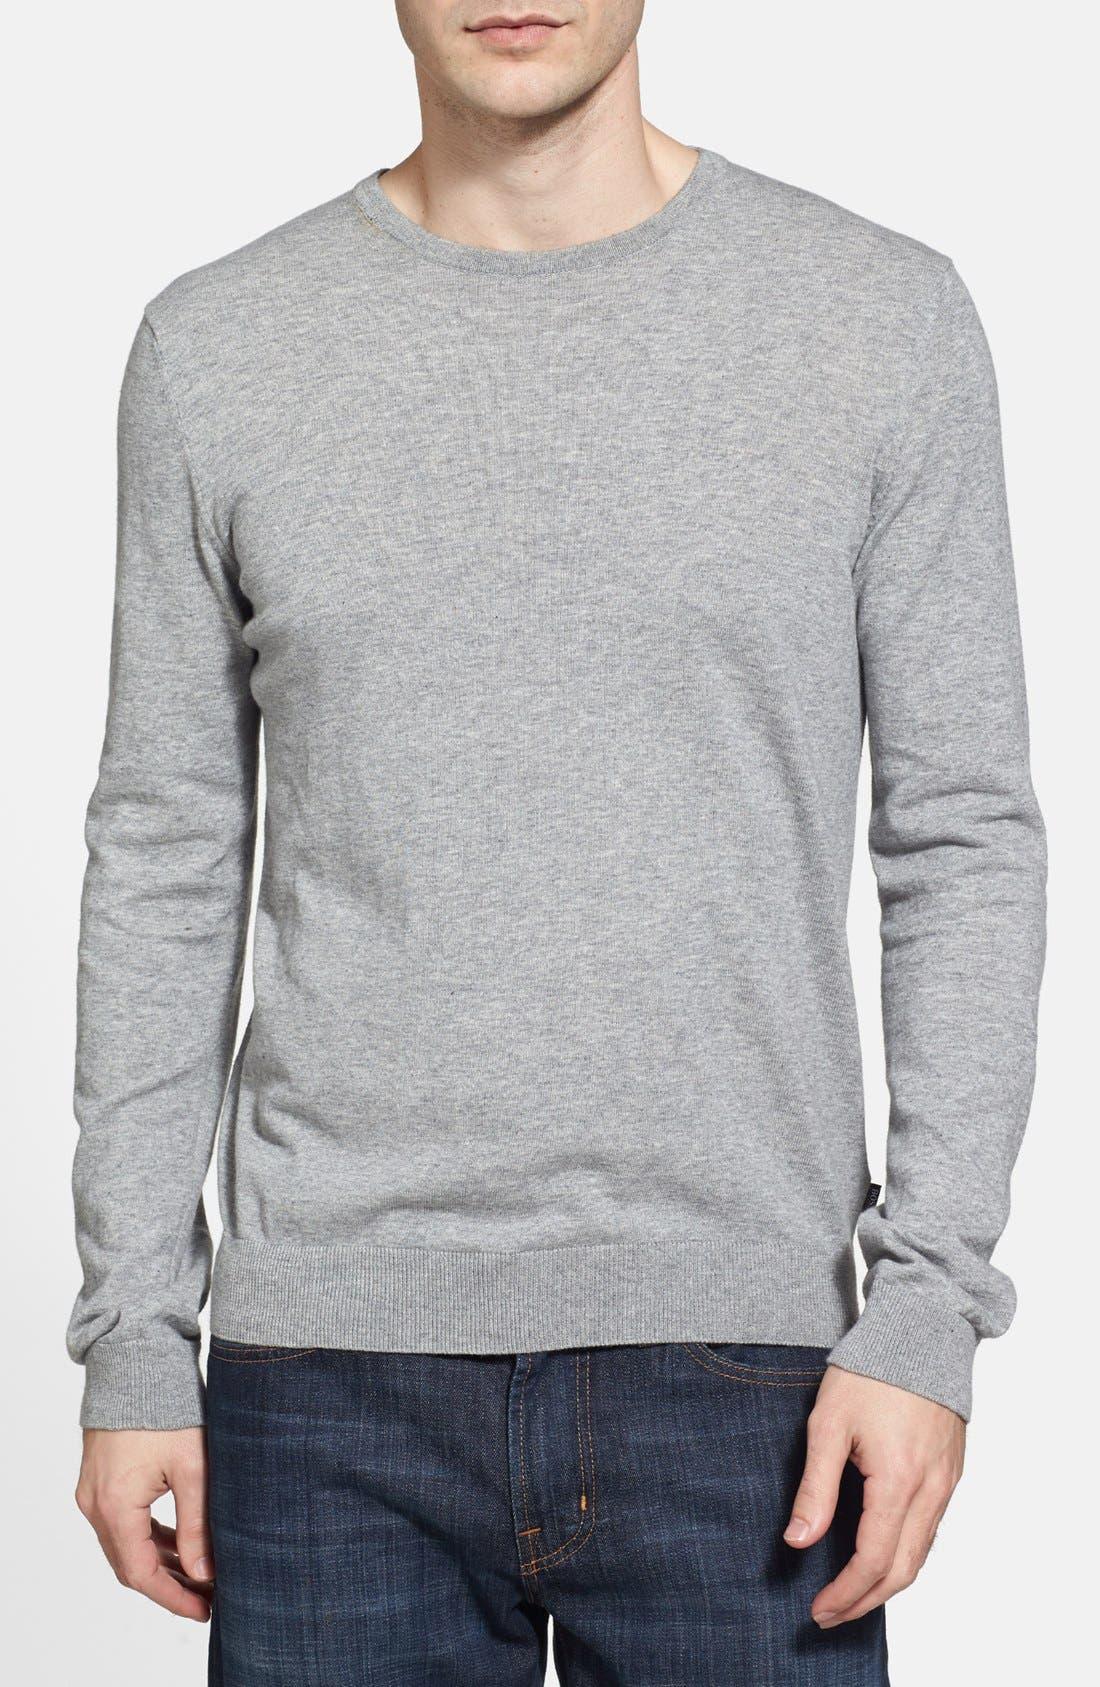 Alternate Image 1 Selected - BOSS HUGO BOSS 'Perinus' Crewneck Sweater